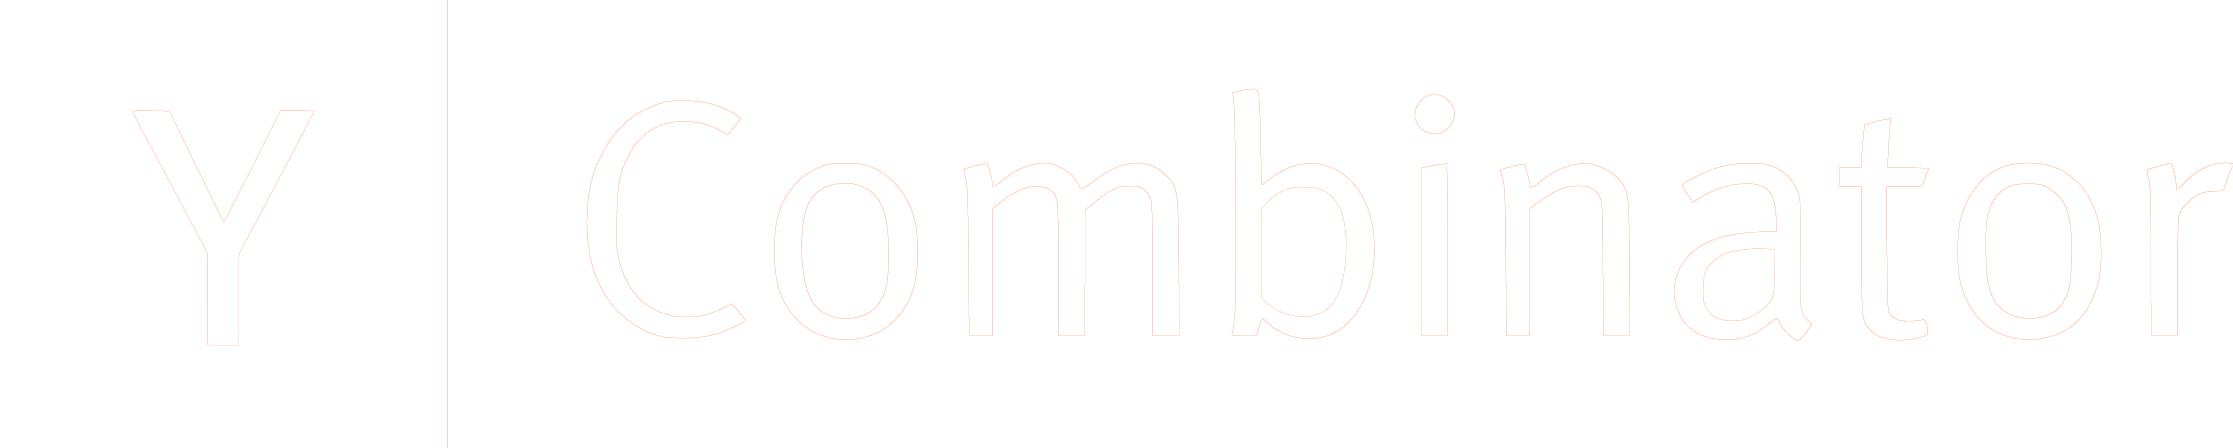 Y Combinator Logo white